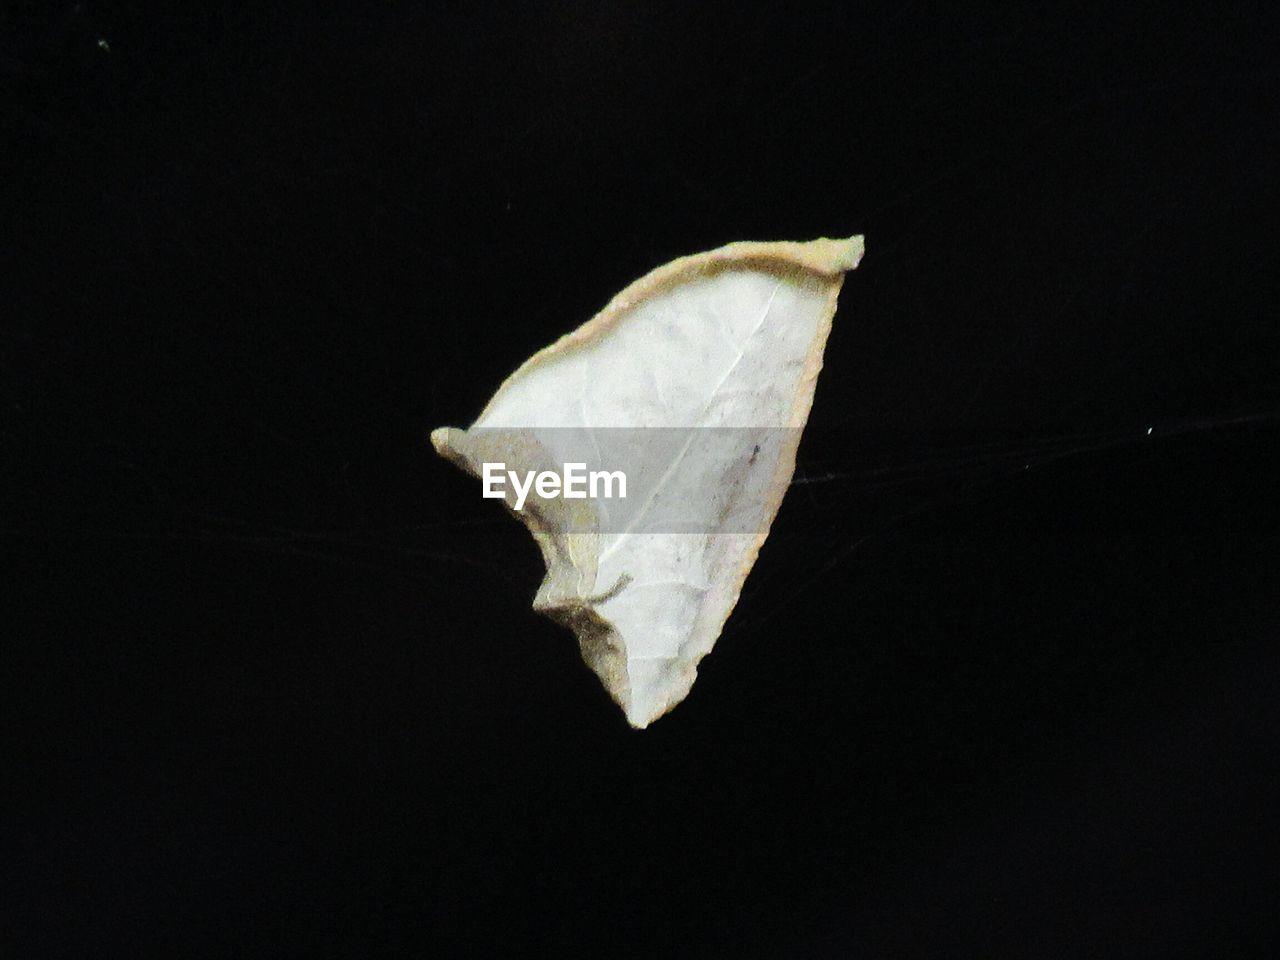 black background, leaf, single object, studio shot, no people, close-up, change, night, fragility, outdoors